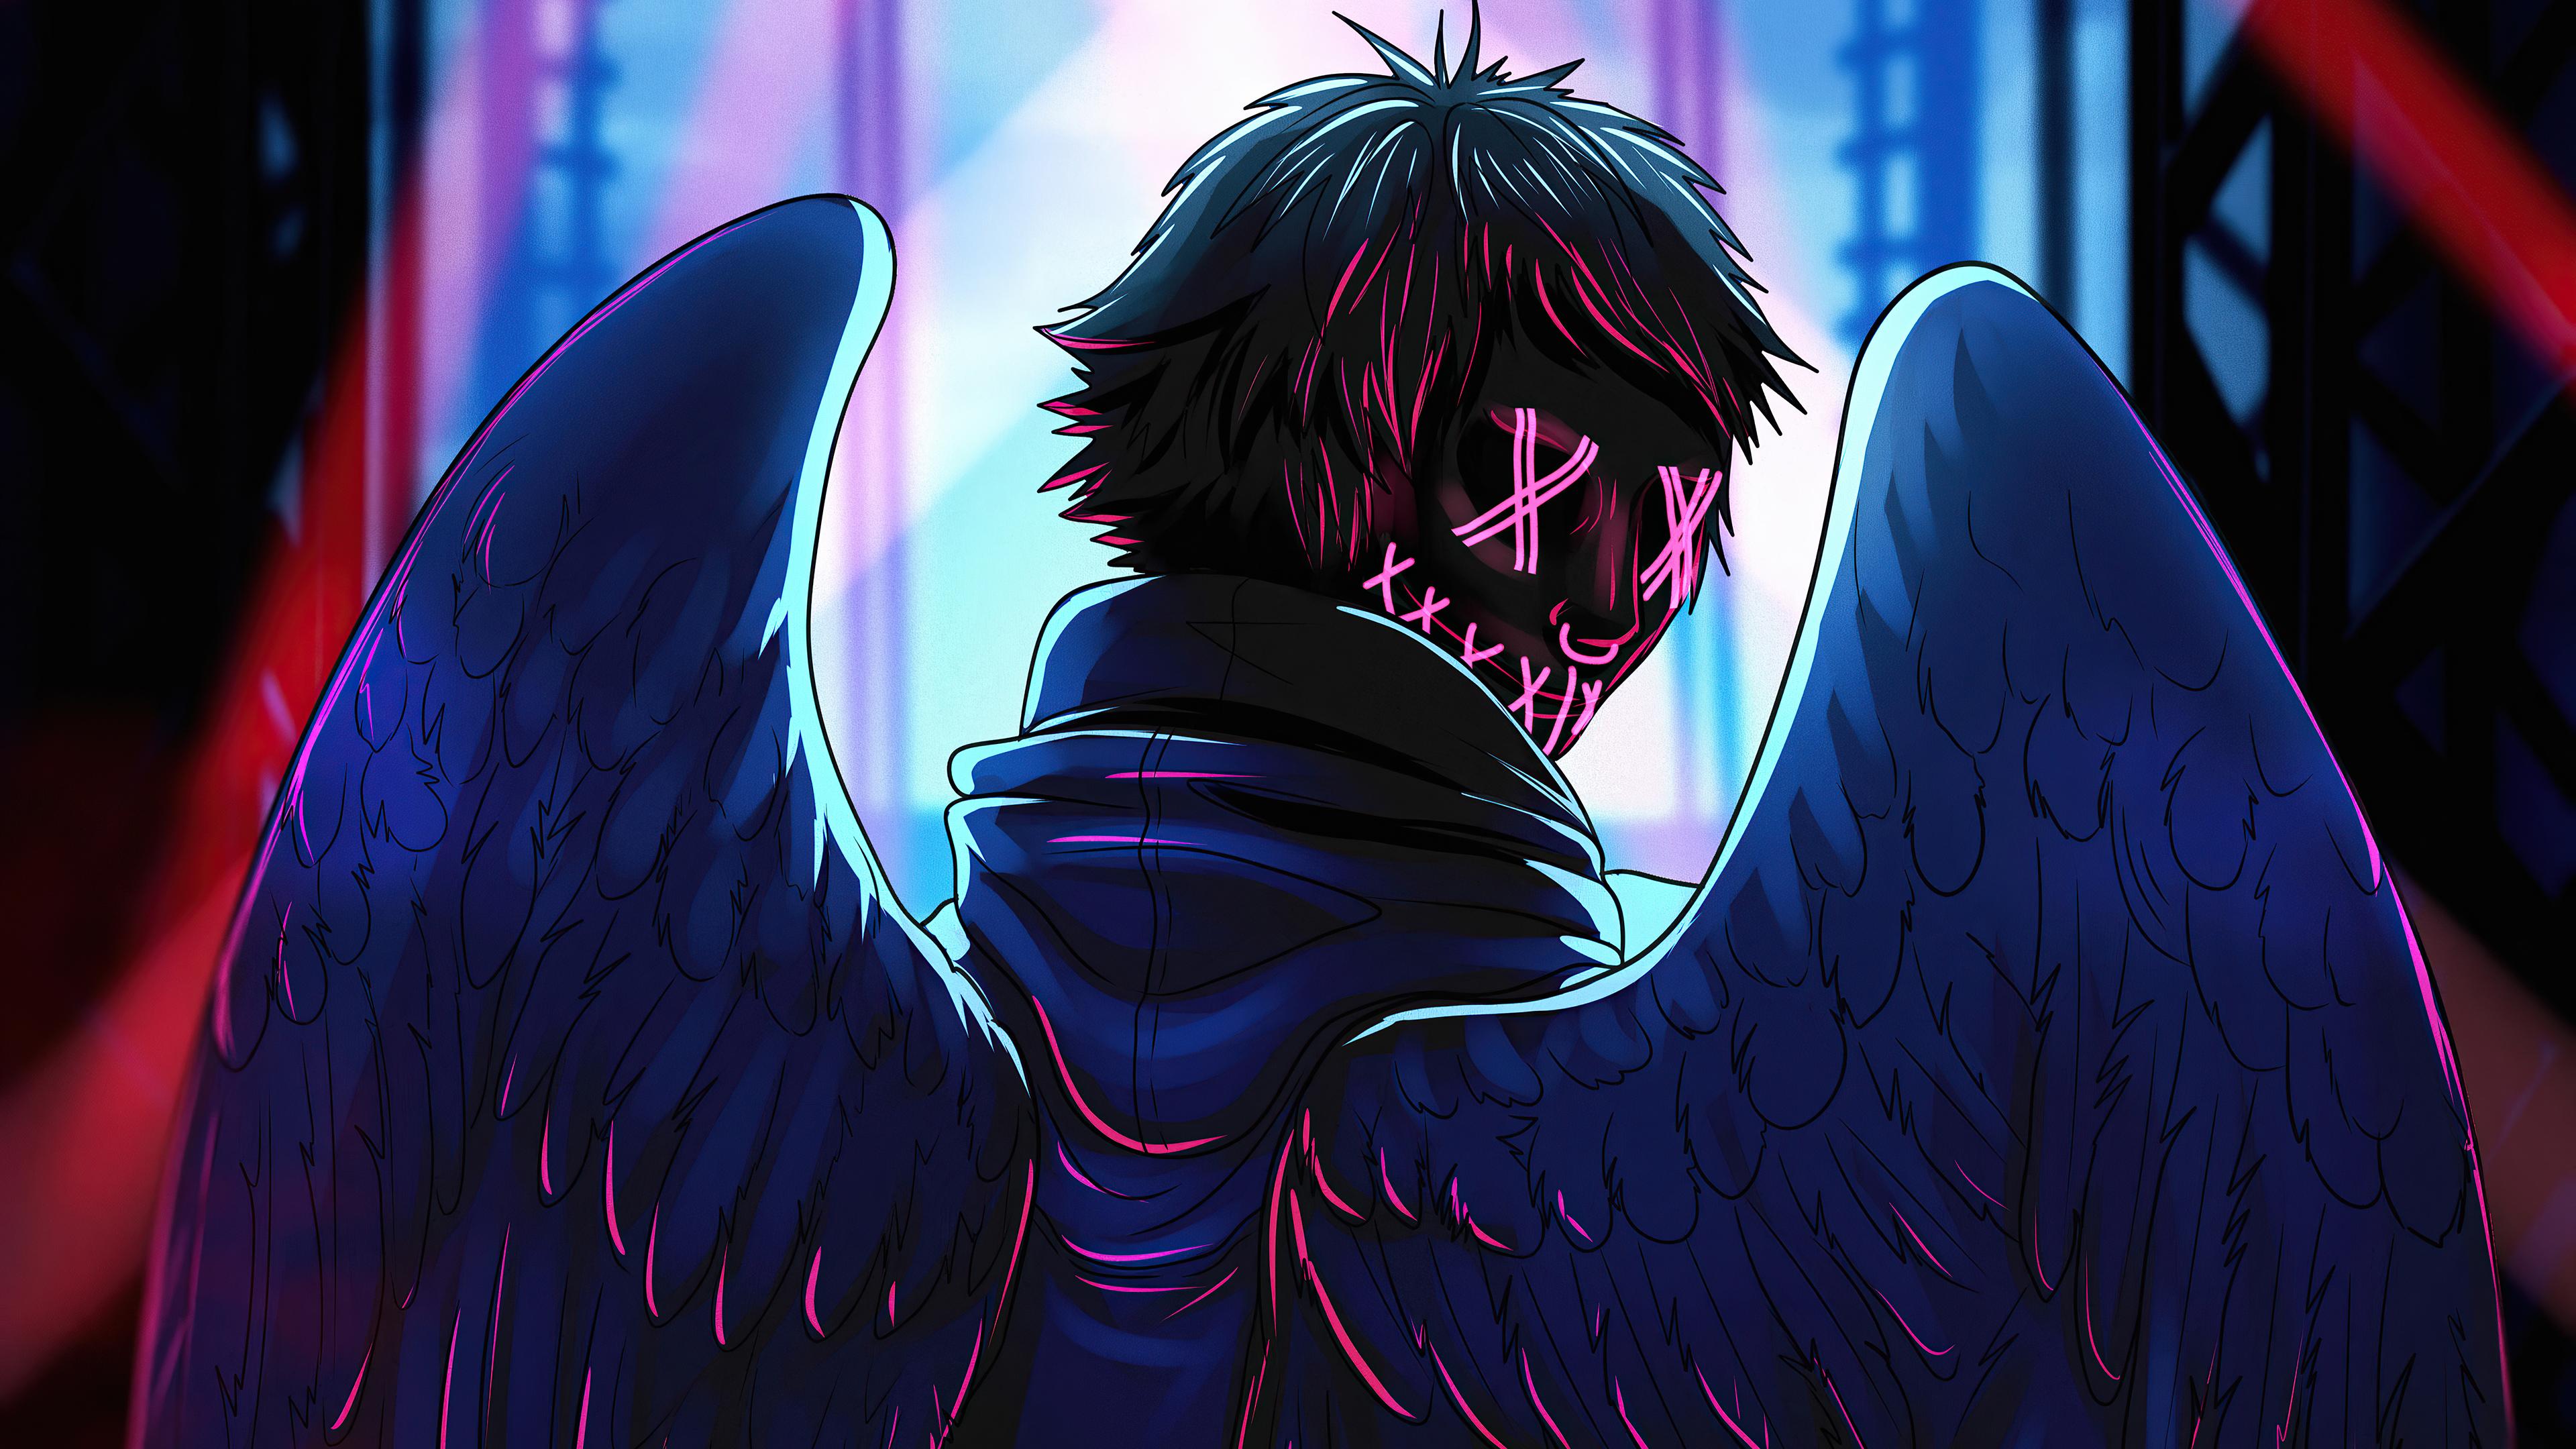 Neon Angel Boy 4k, HD Artist, 4k Wallpapers, Images ...